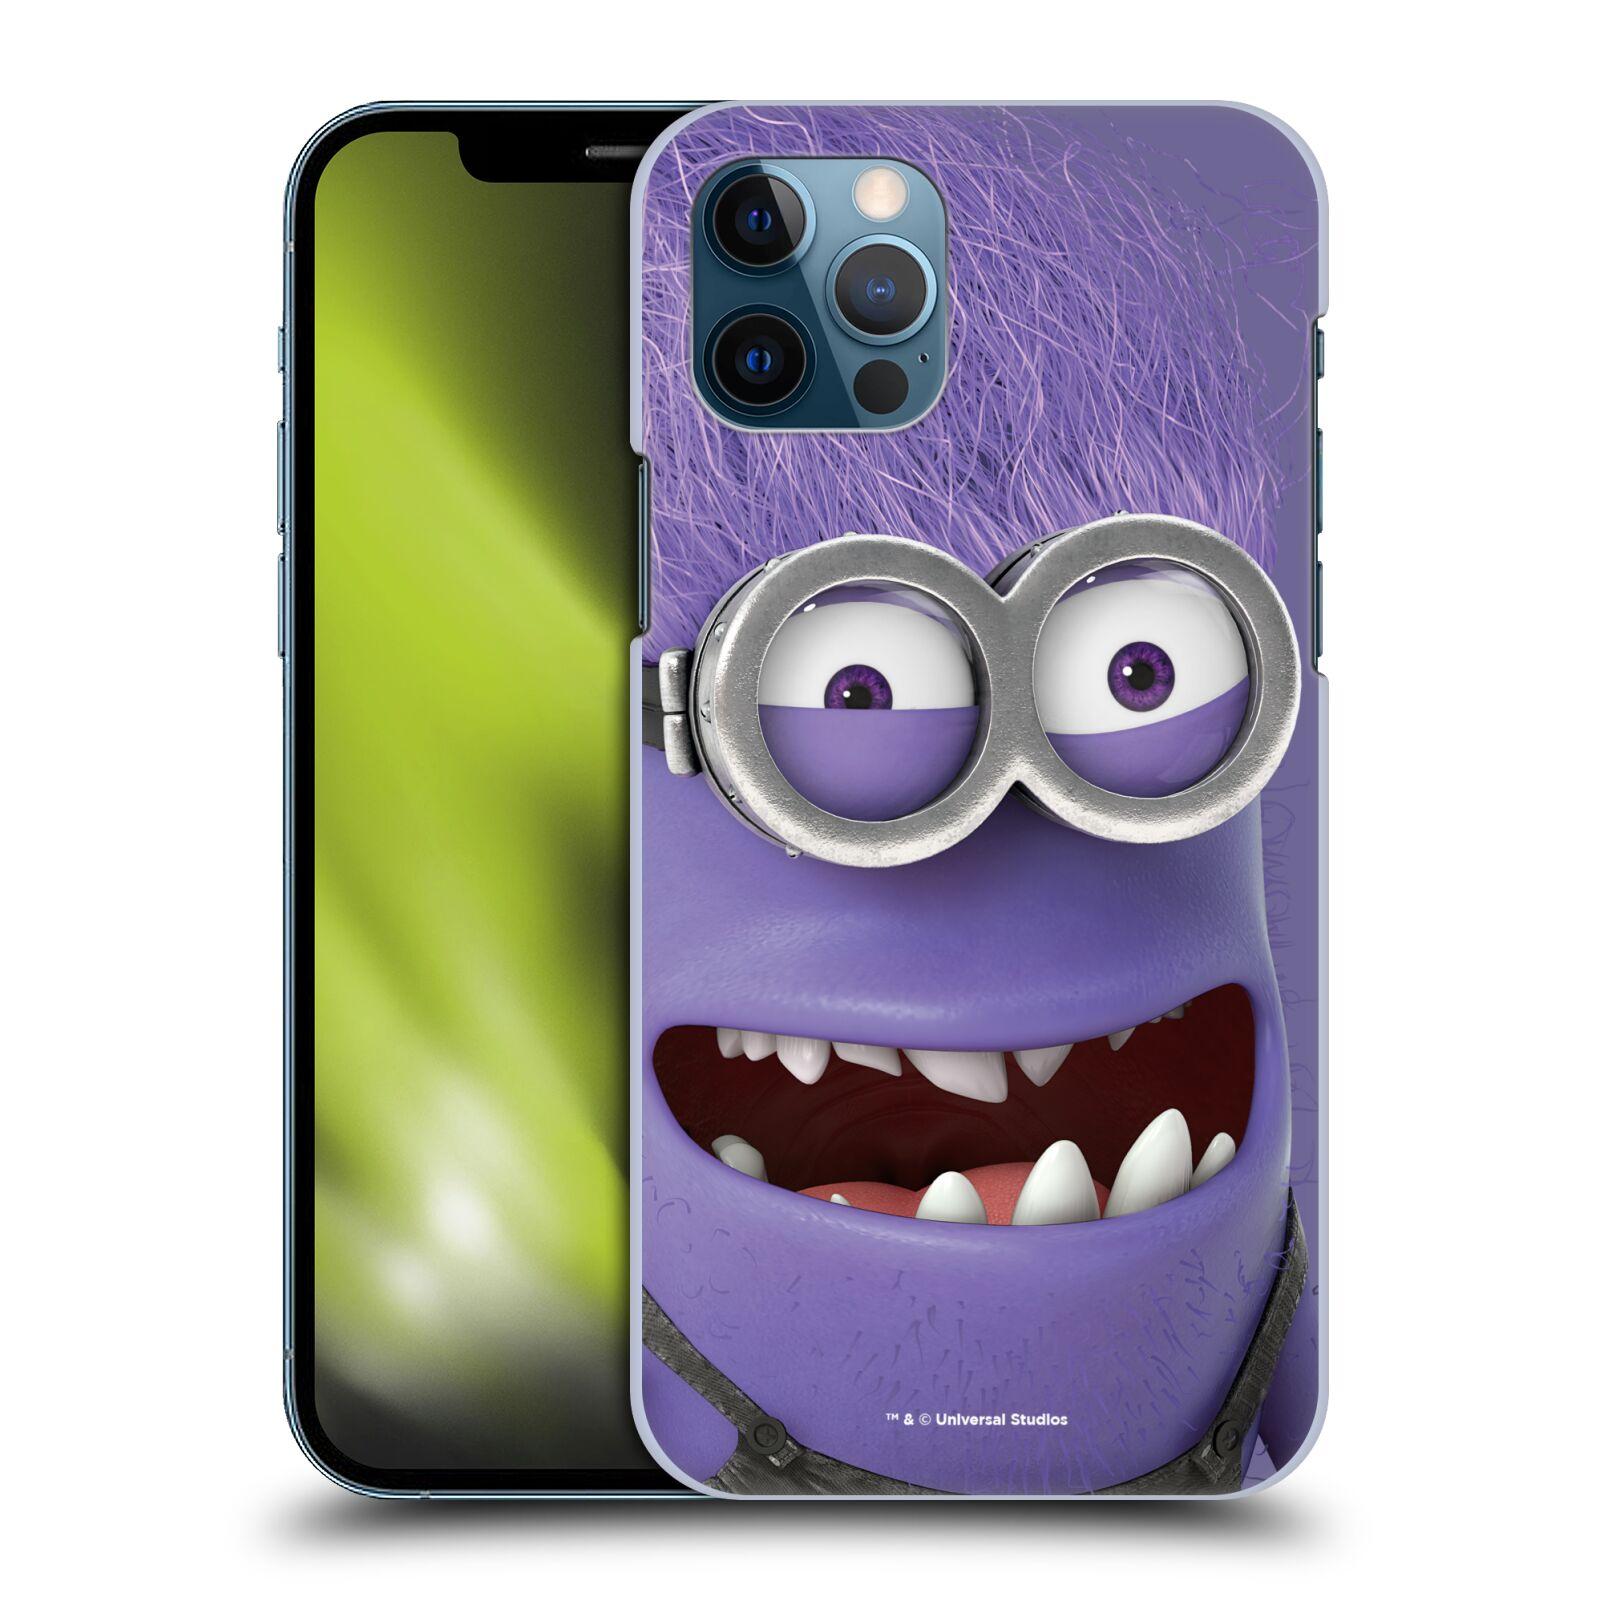 Plastové pouzdro na mobil Apple iPhone 12 / 12 Pro - Head Case - Zlý Mimoň z filmu Já, padouch - Despicable Me